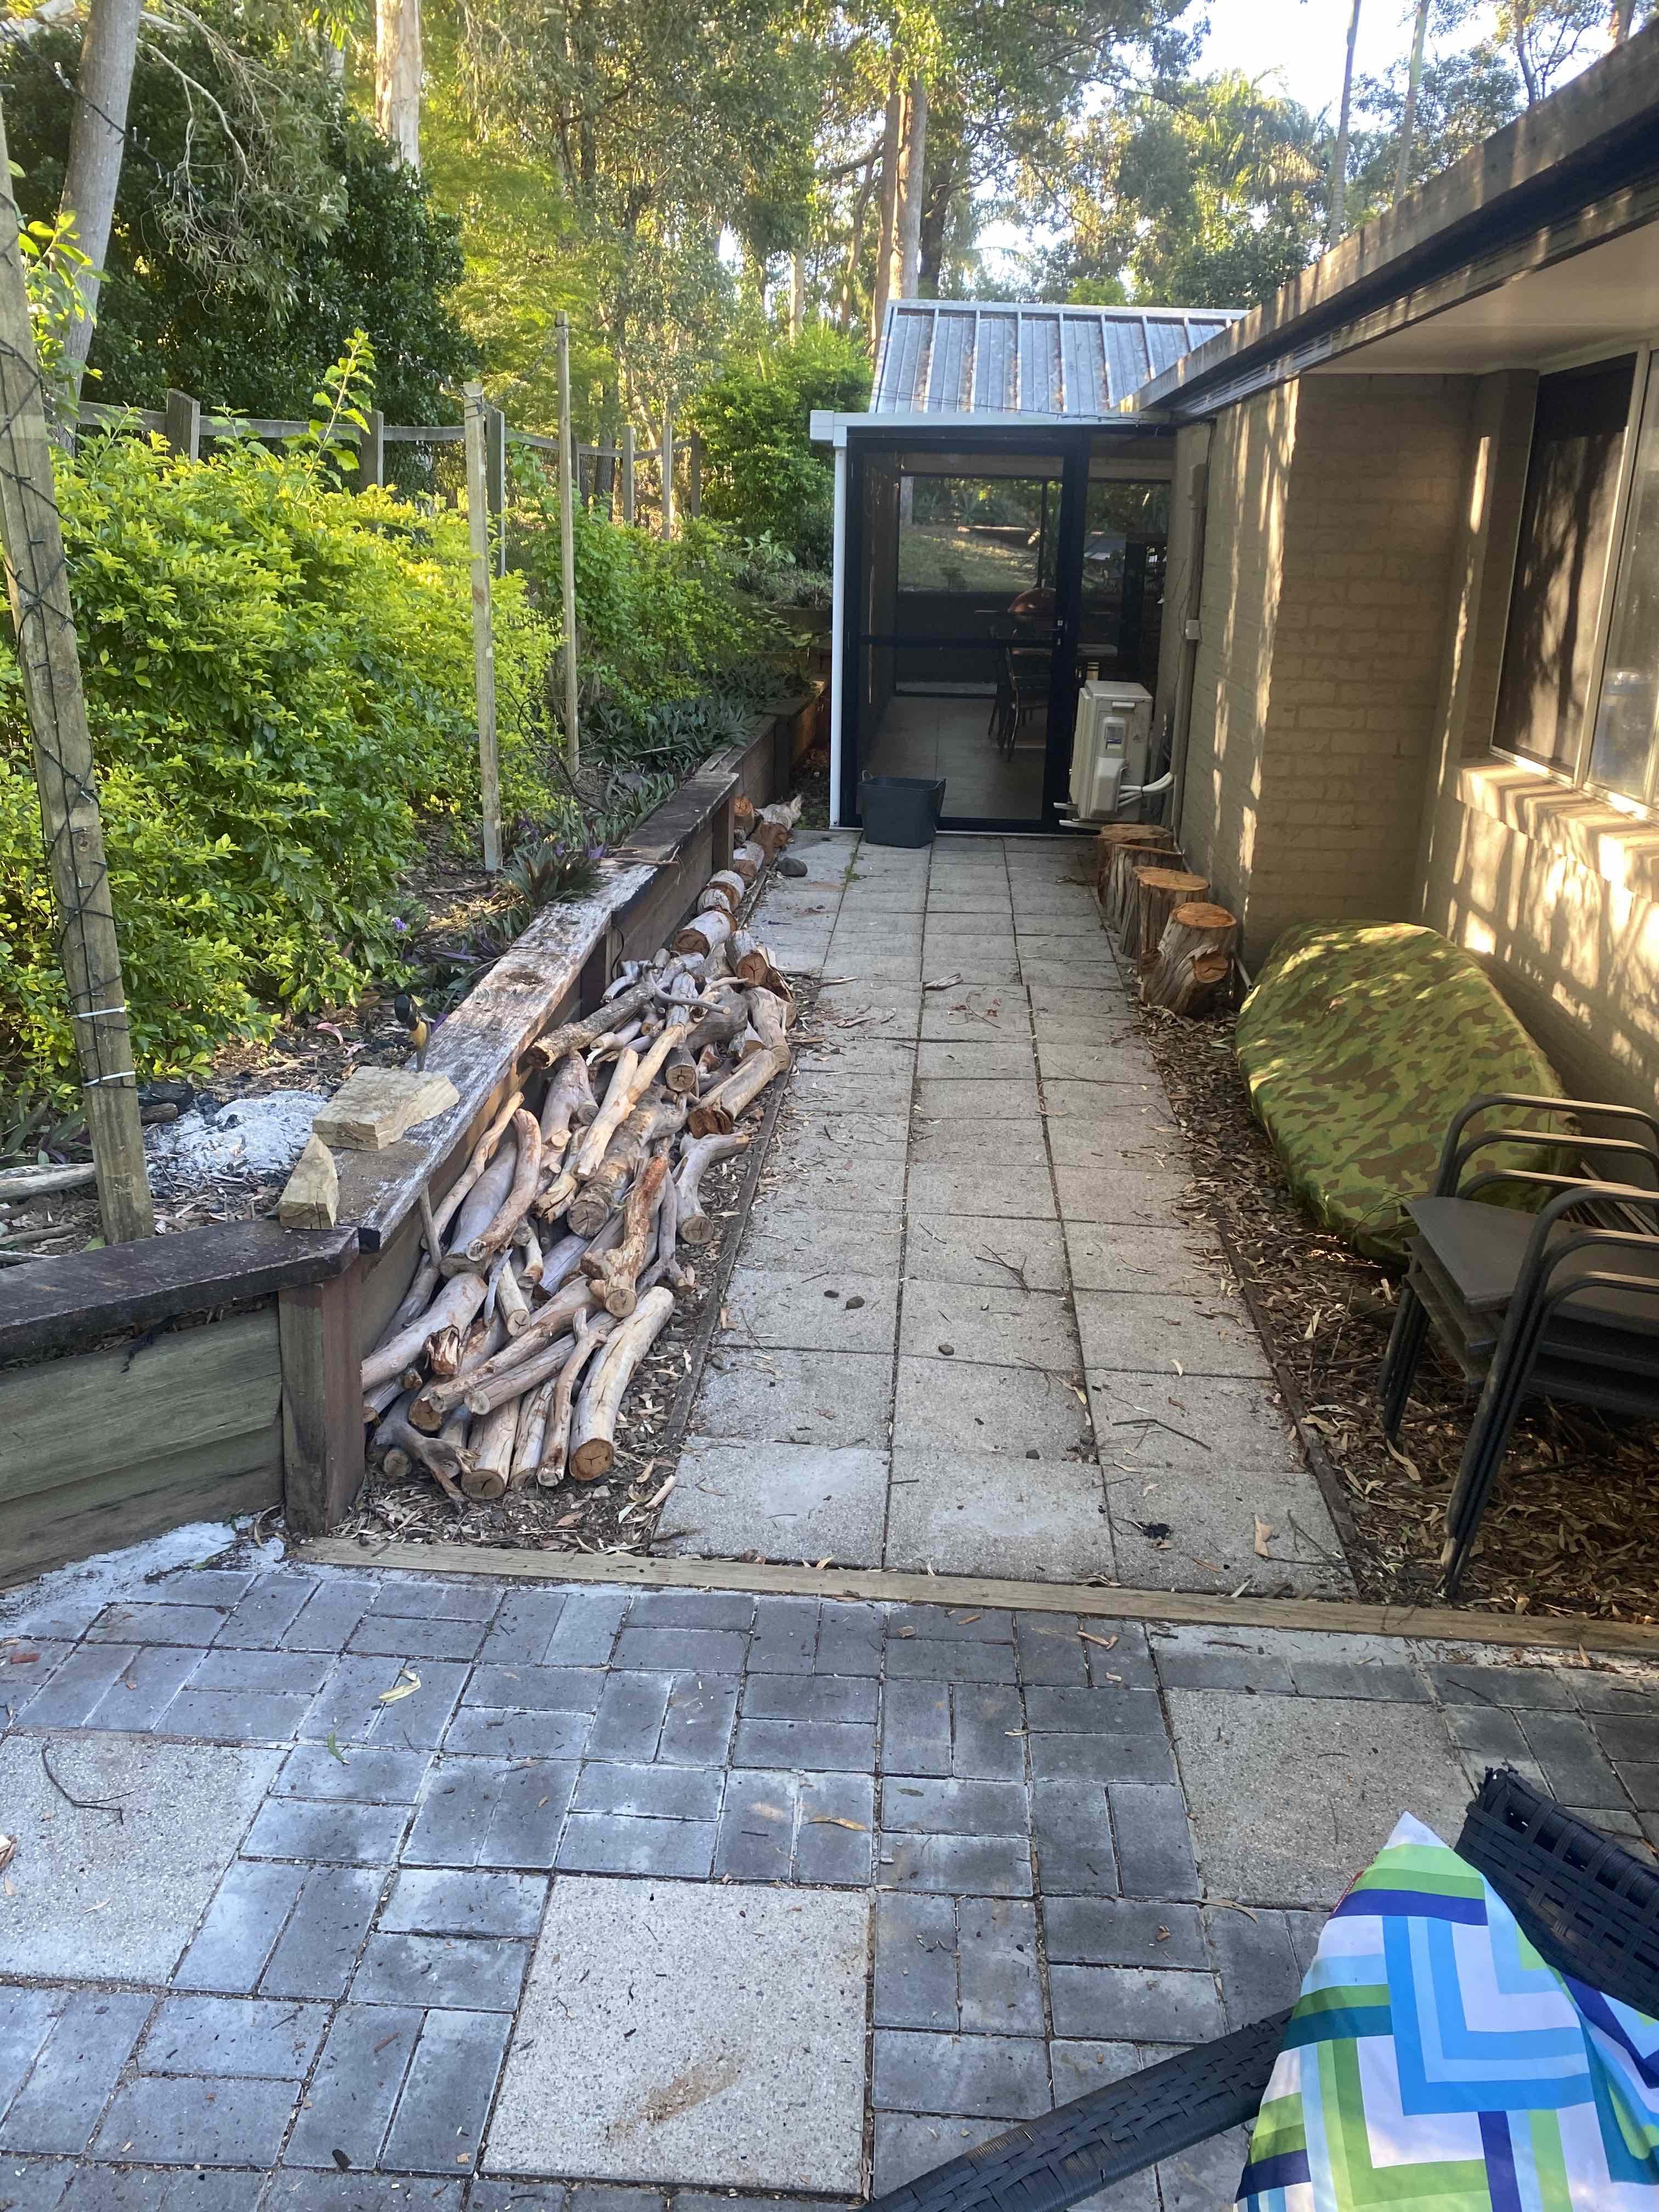 Covid_firewood2.jpg